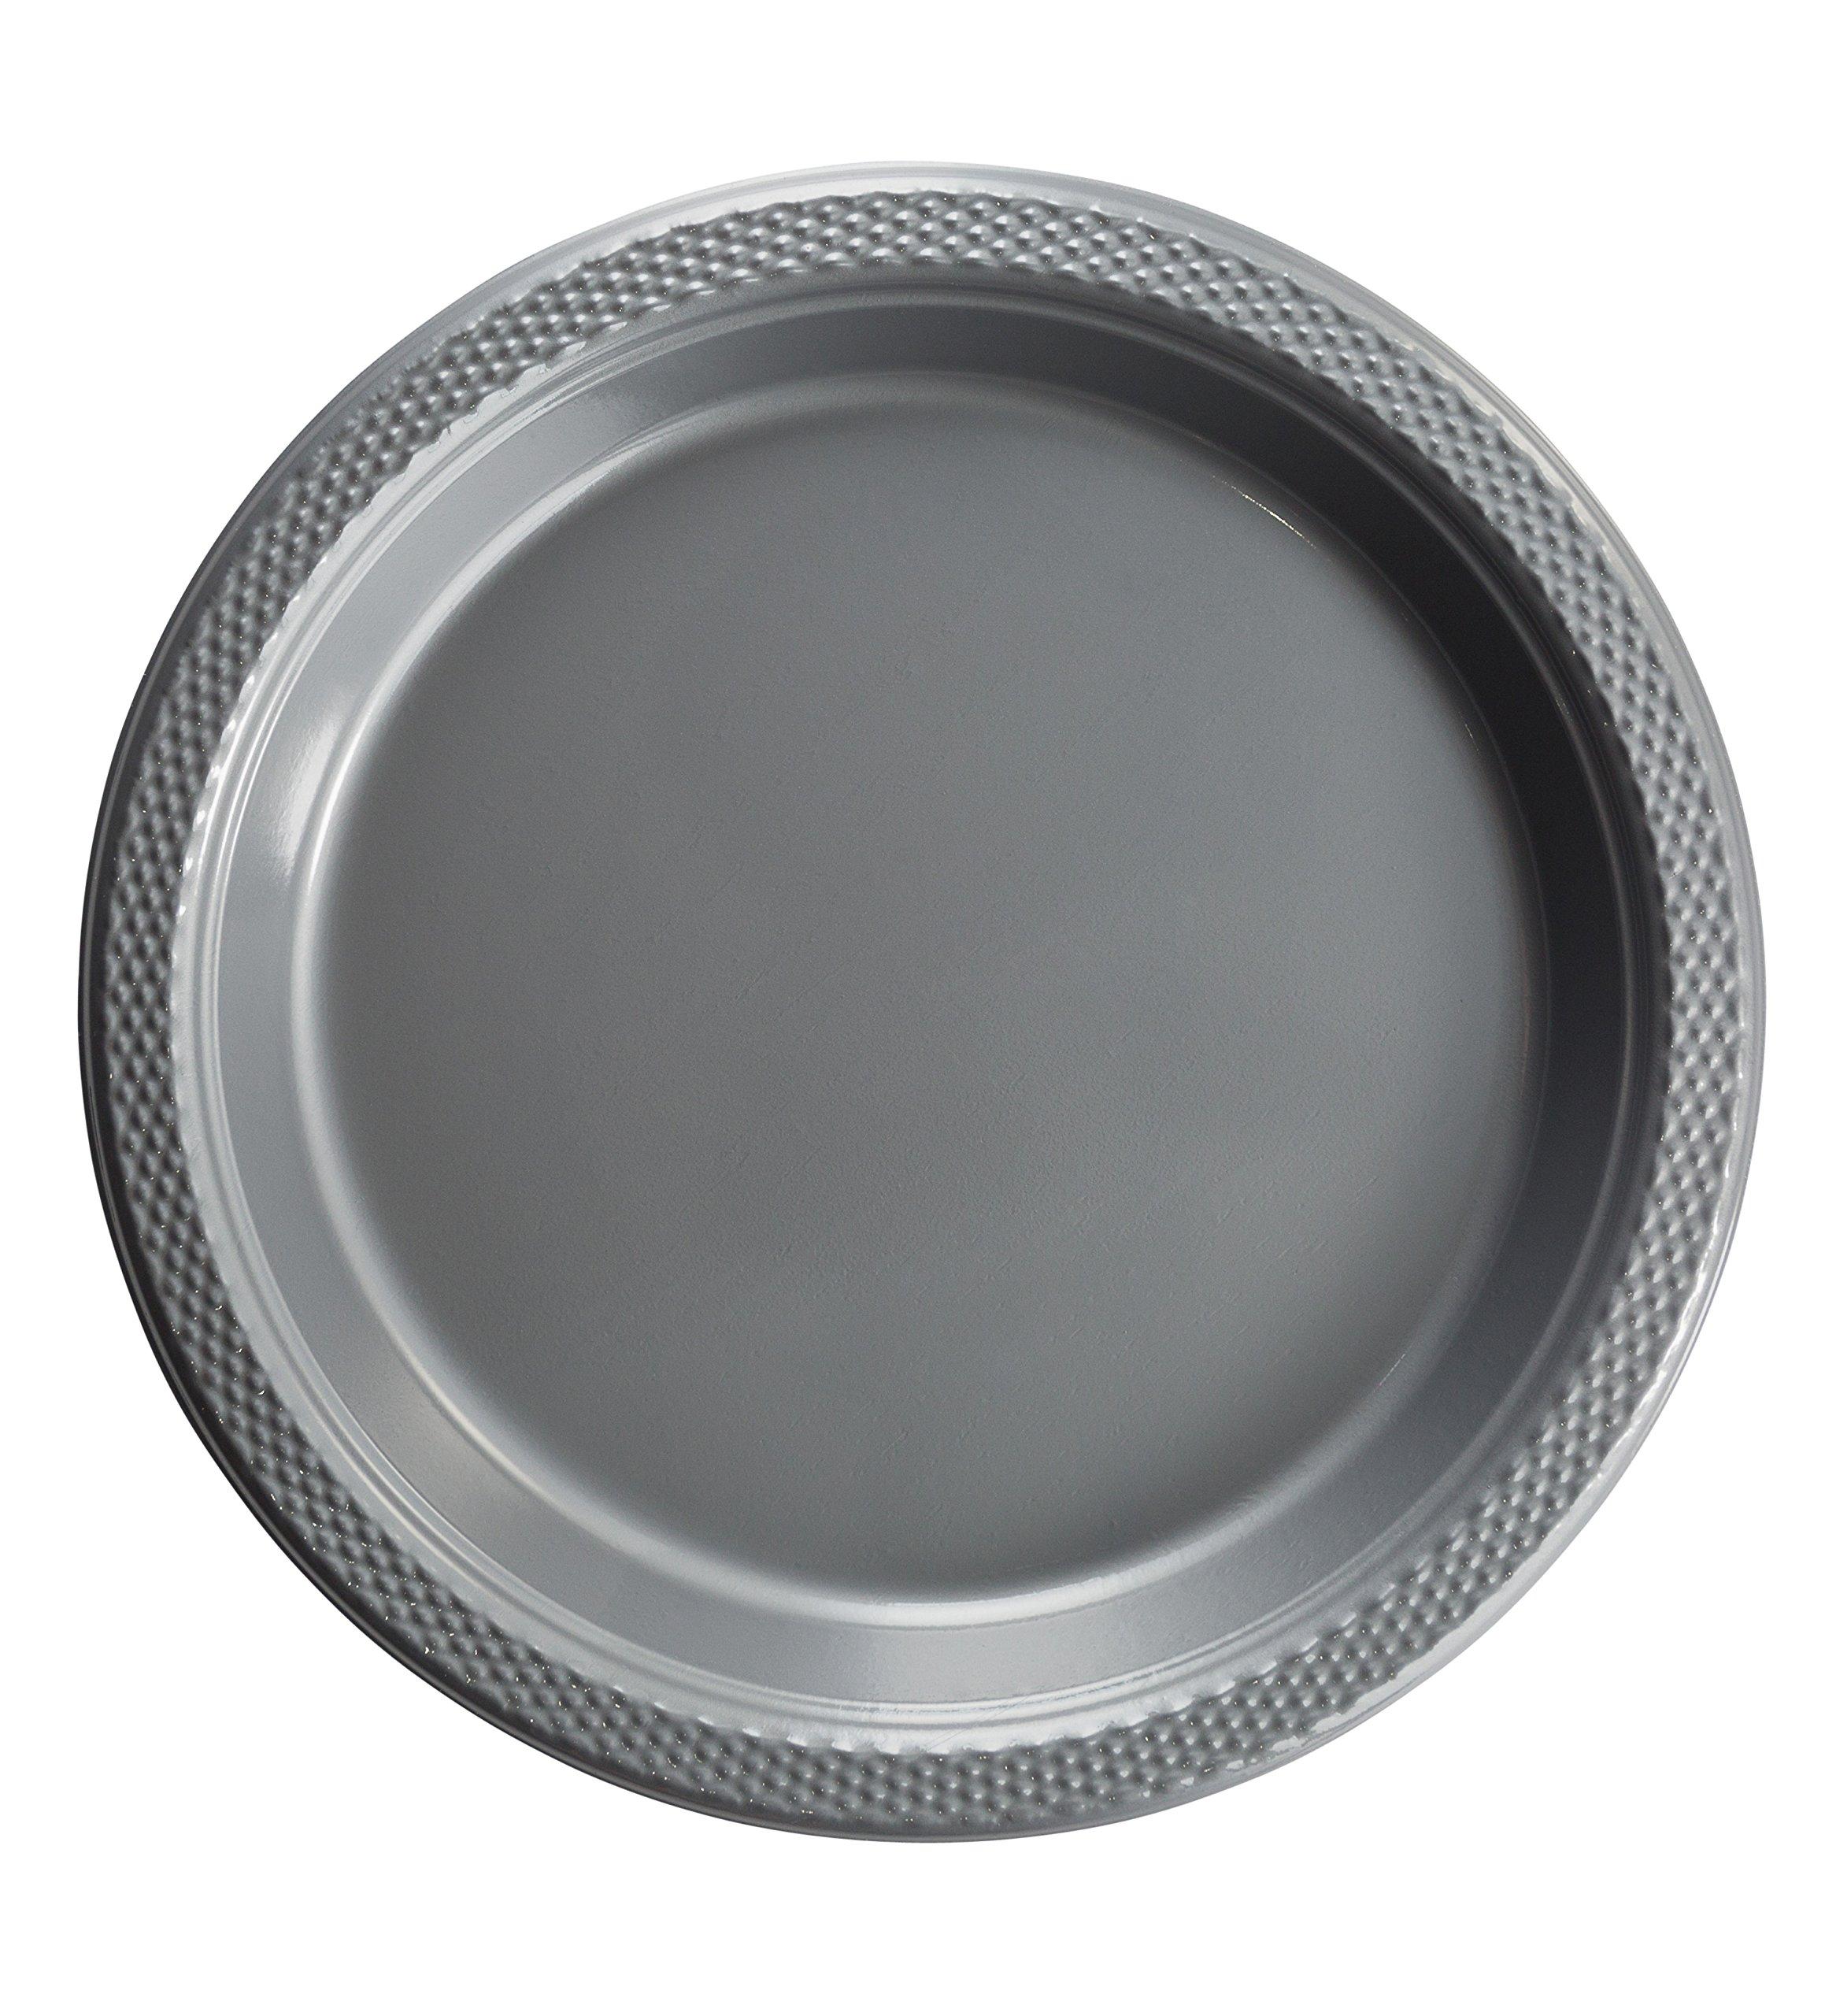 Exquisite Plastic Dessert/Salad Plates - Solid Color Disposable Plates - 100 Count (10 Inch, Silver)